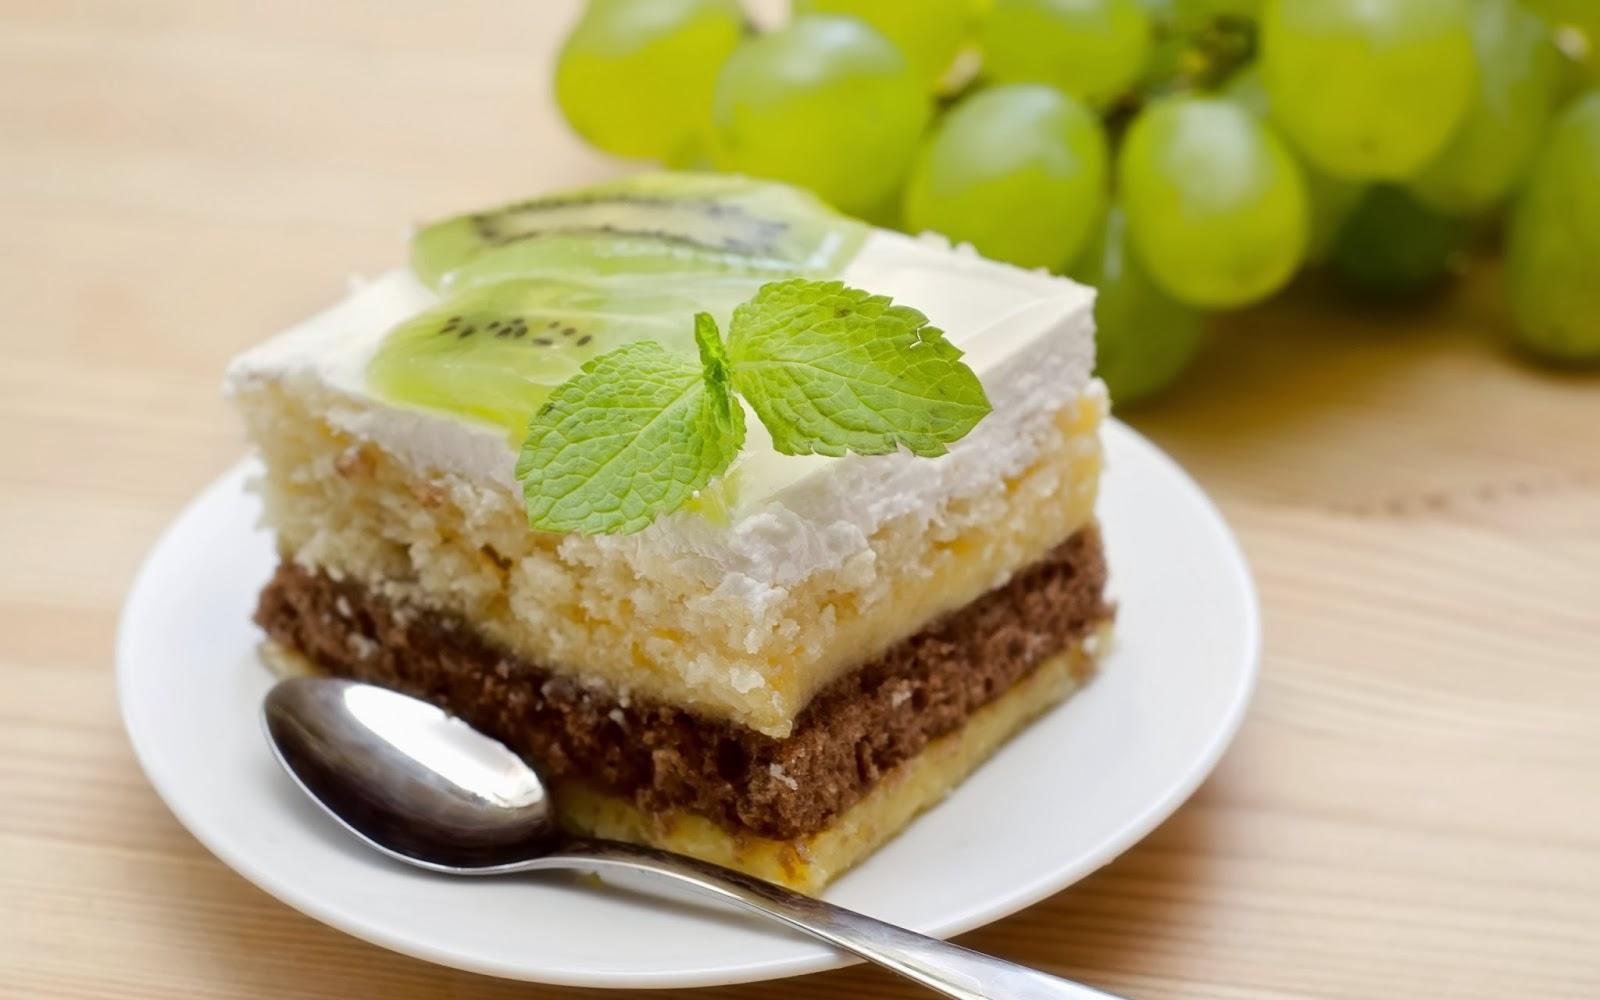 Cake Recipes Download: Download Best Hd Wallpaper